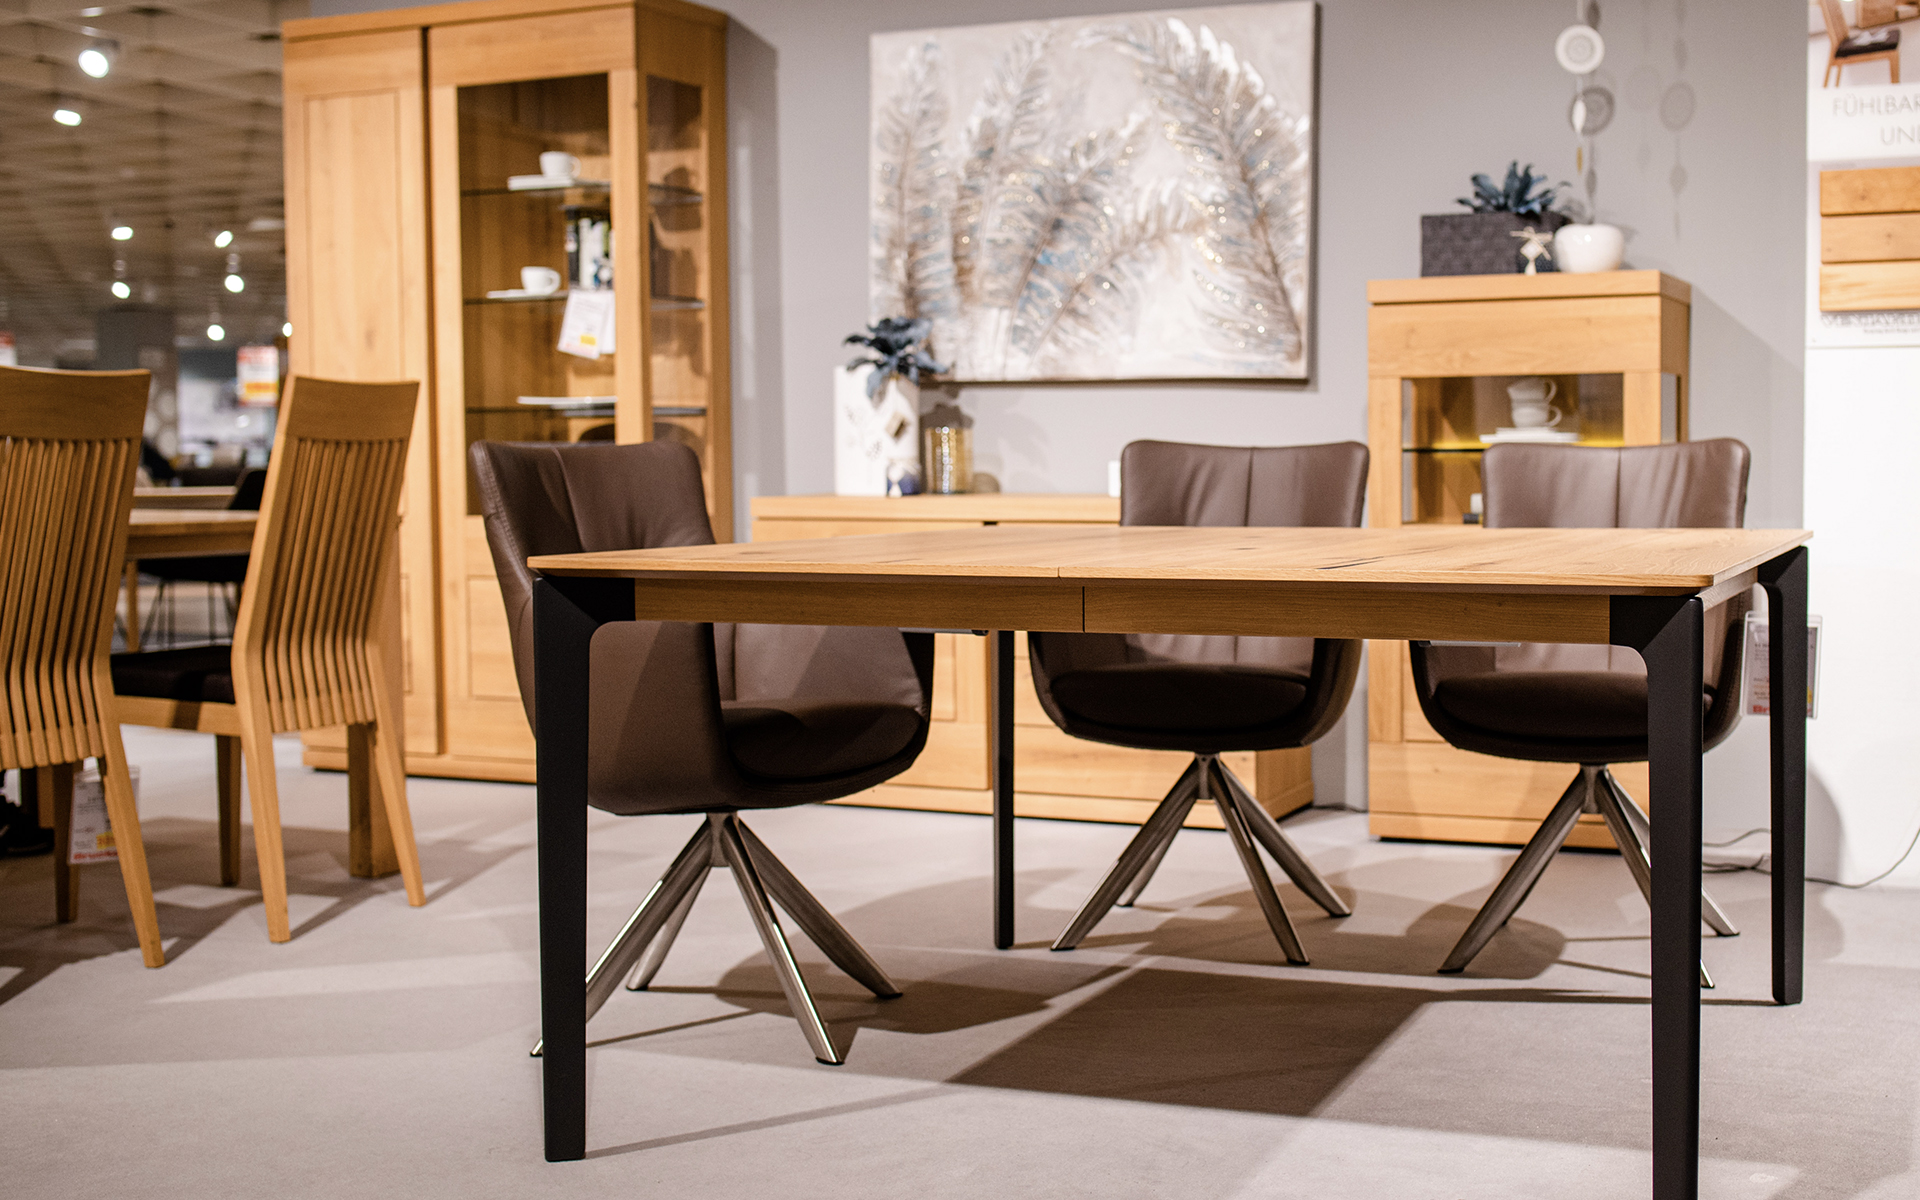 Ela Quadrat - Tisch von Venjakob